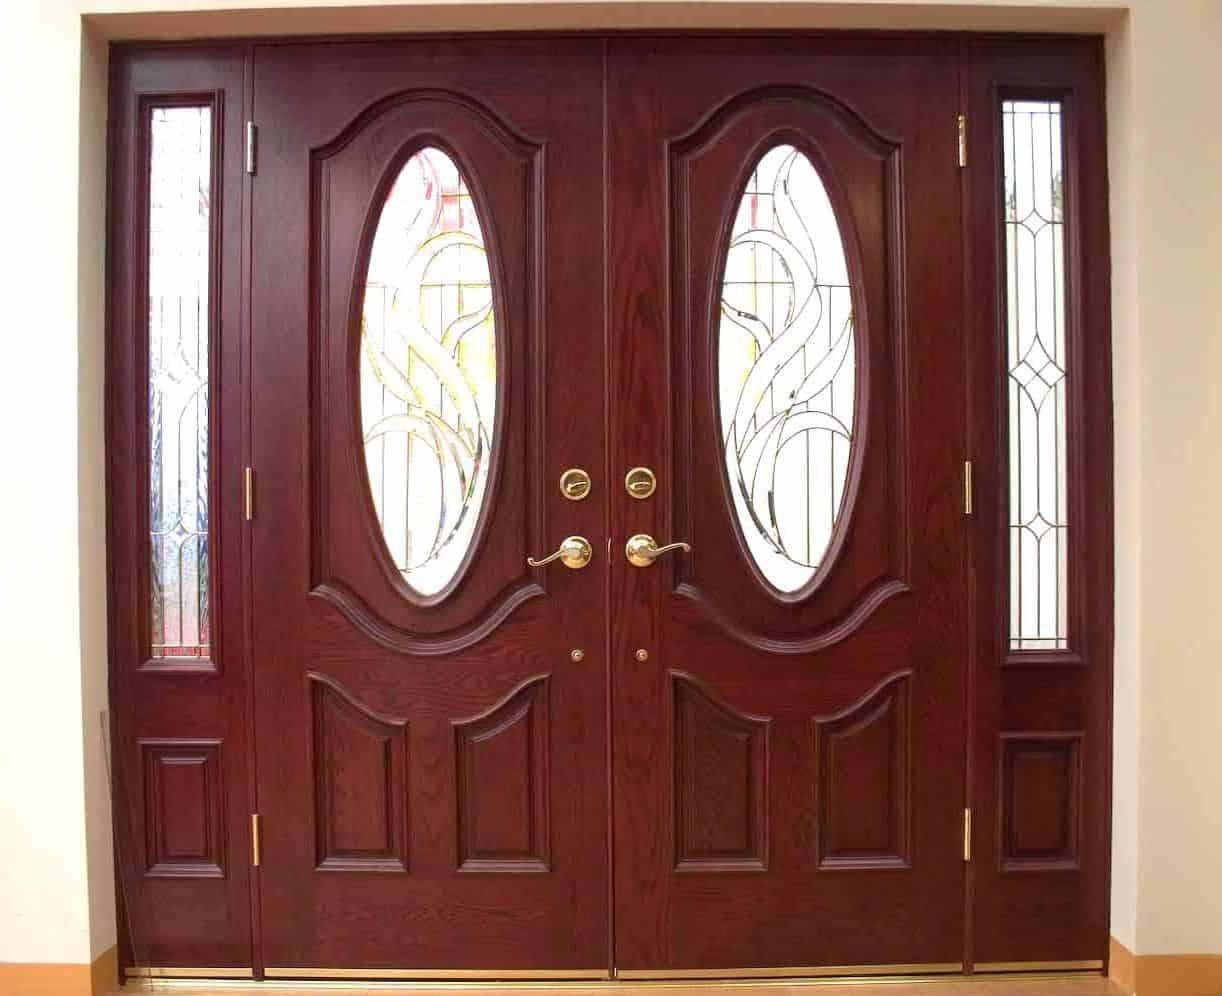 nên dùng cửa gỗ hay cửa nhựa lõi thép